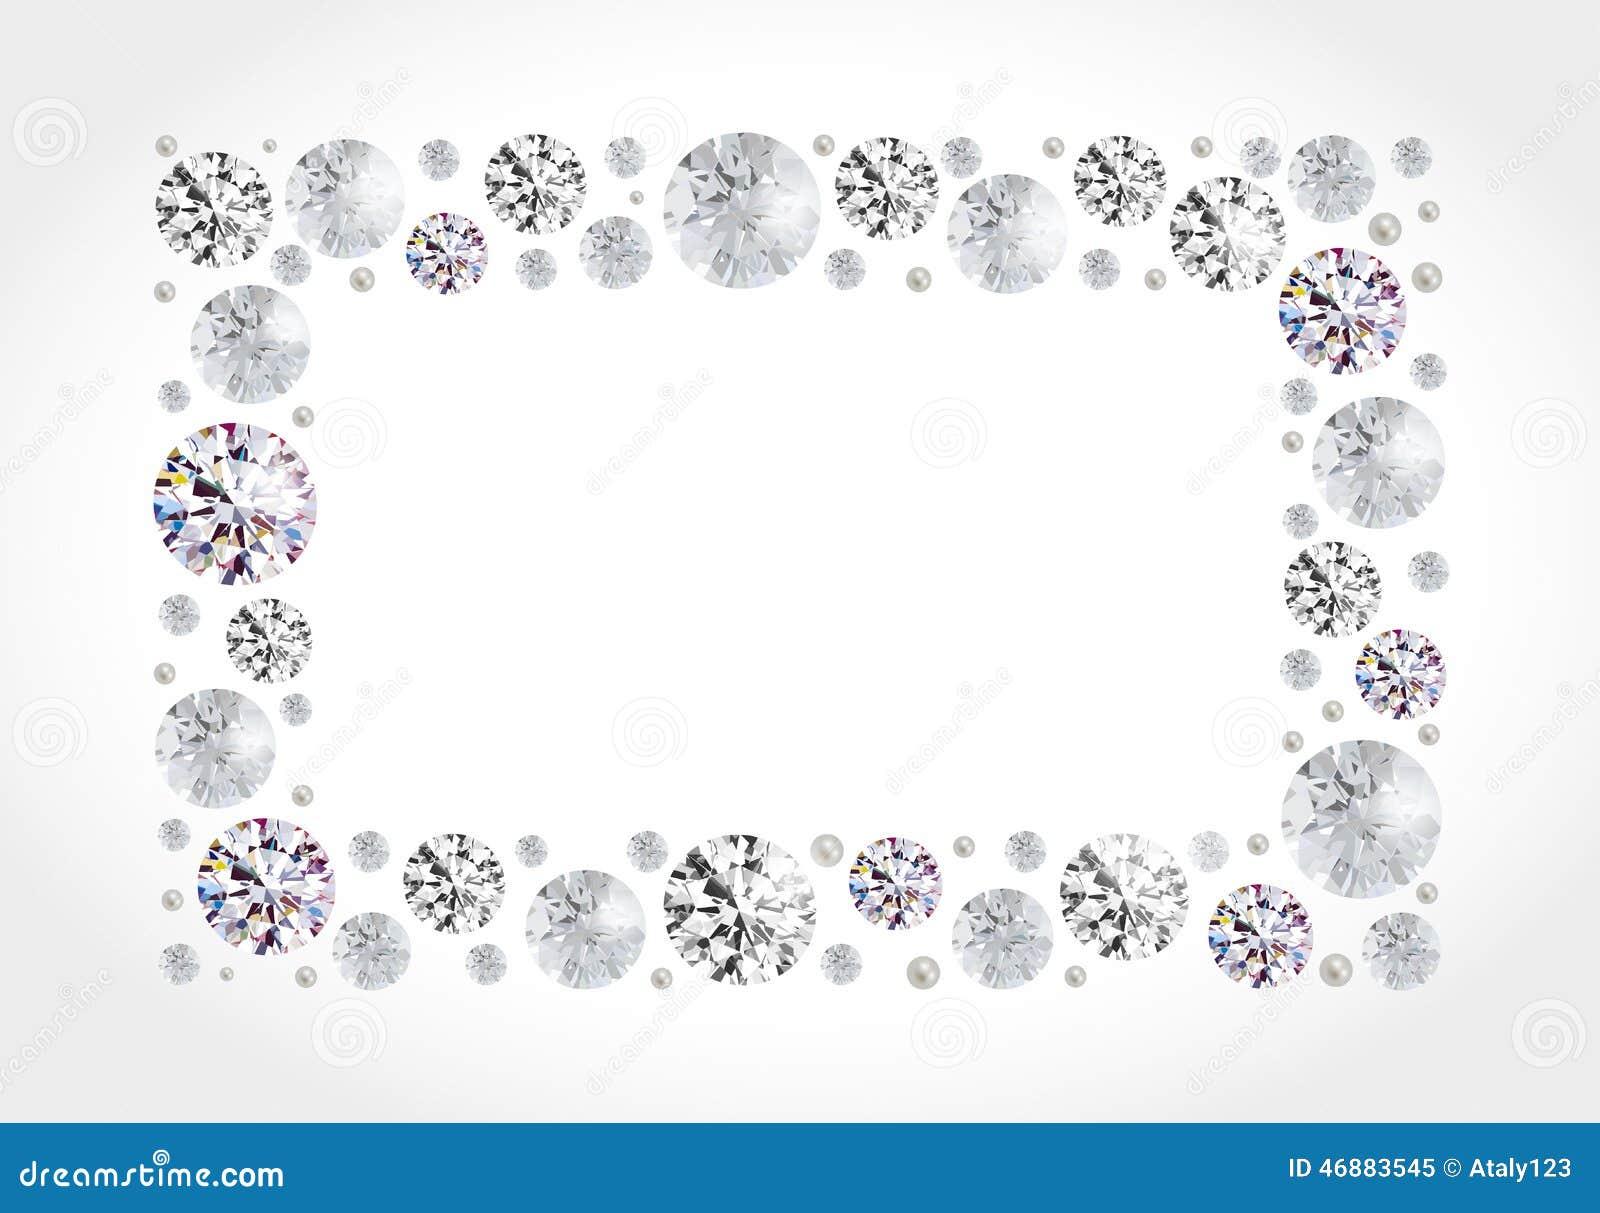 Diamond Frame Stock Vector - Image: 46883545